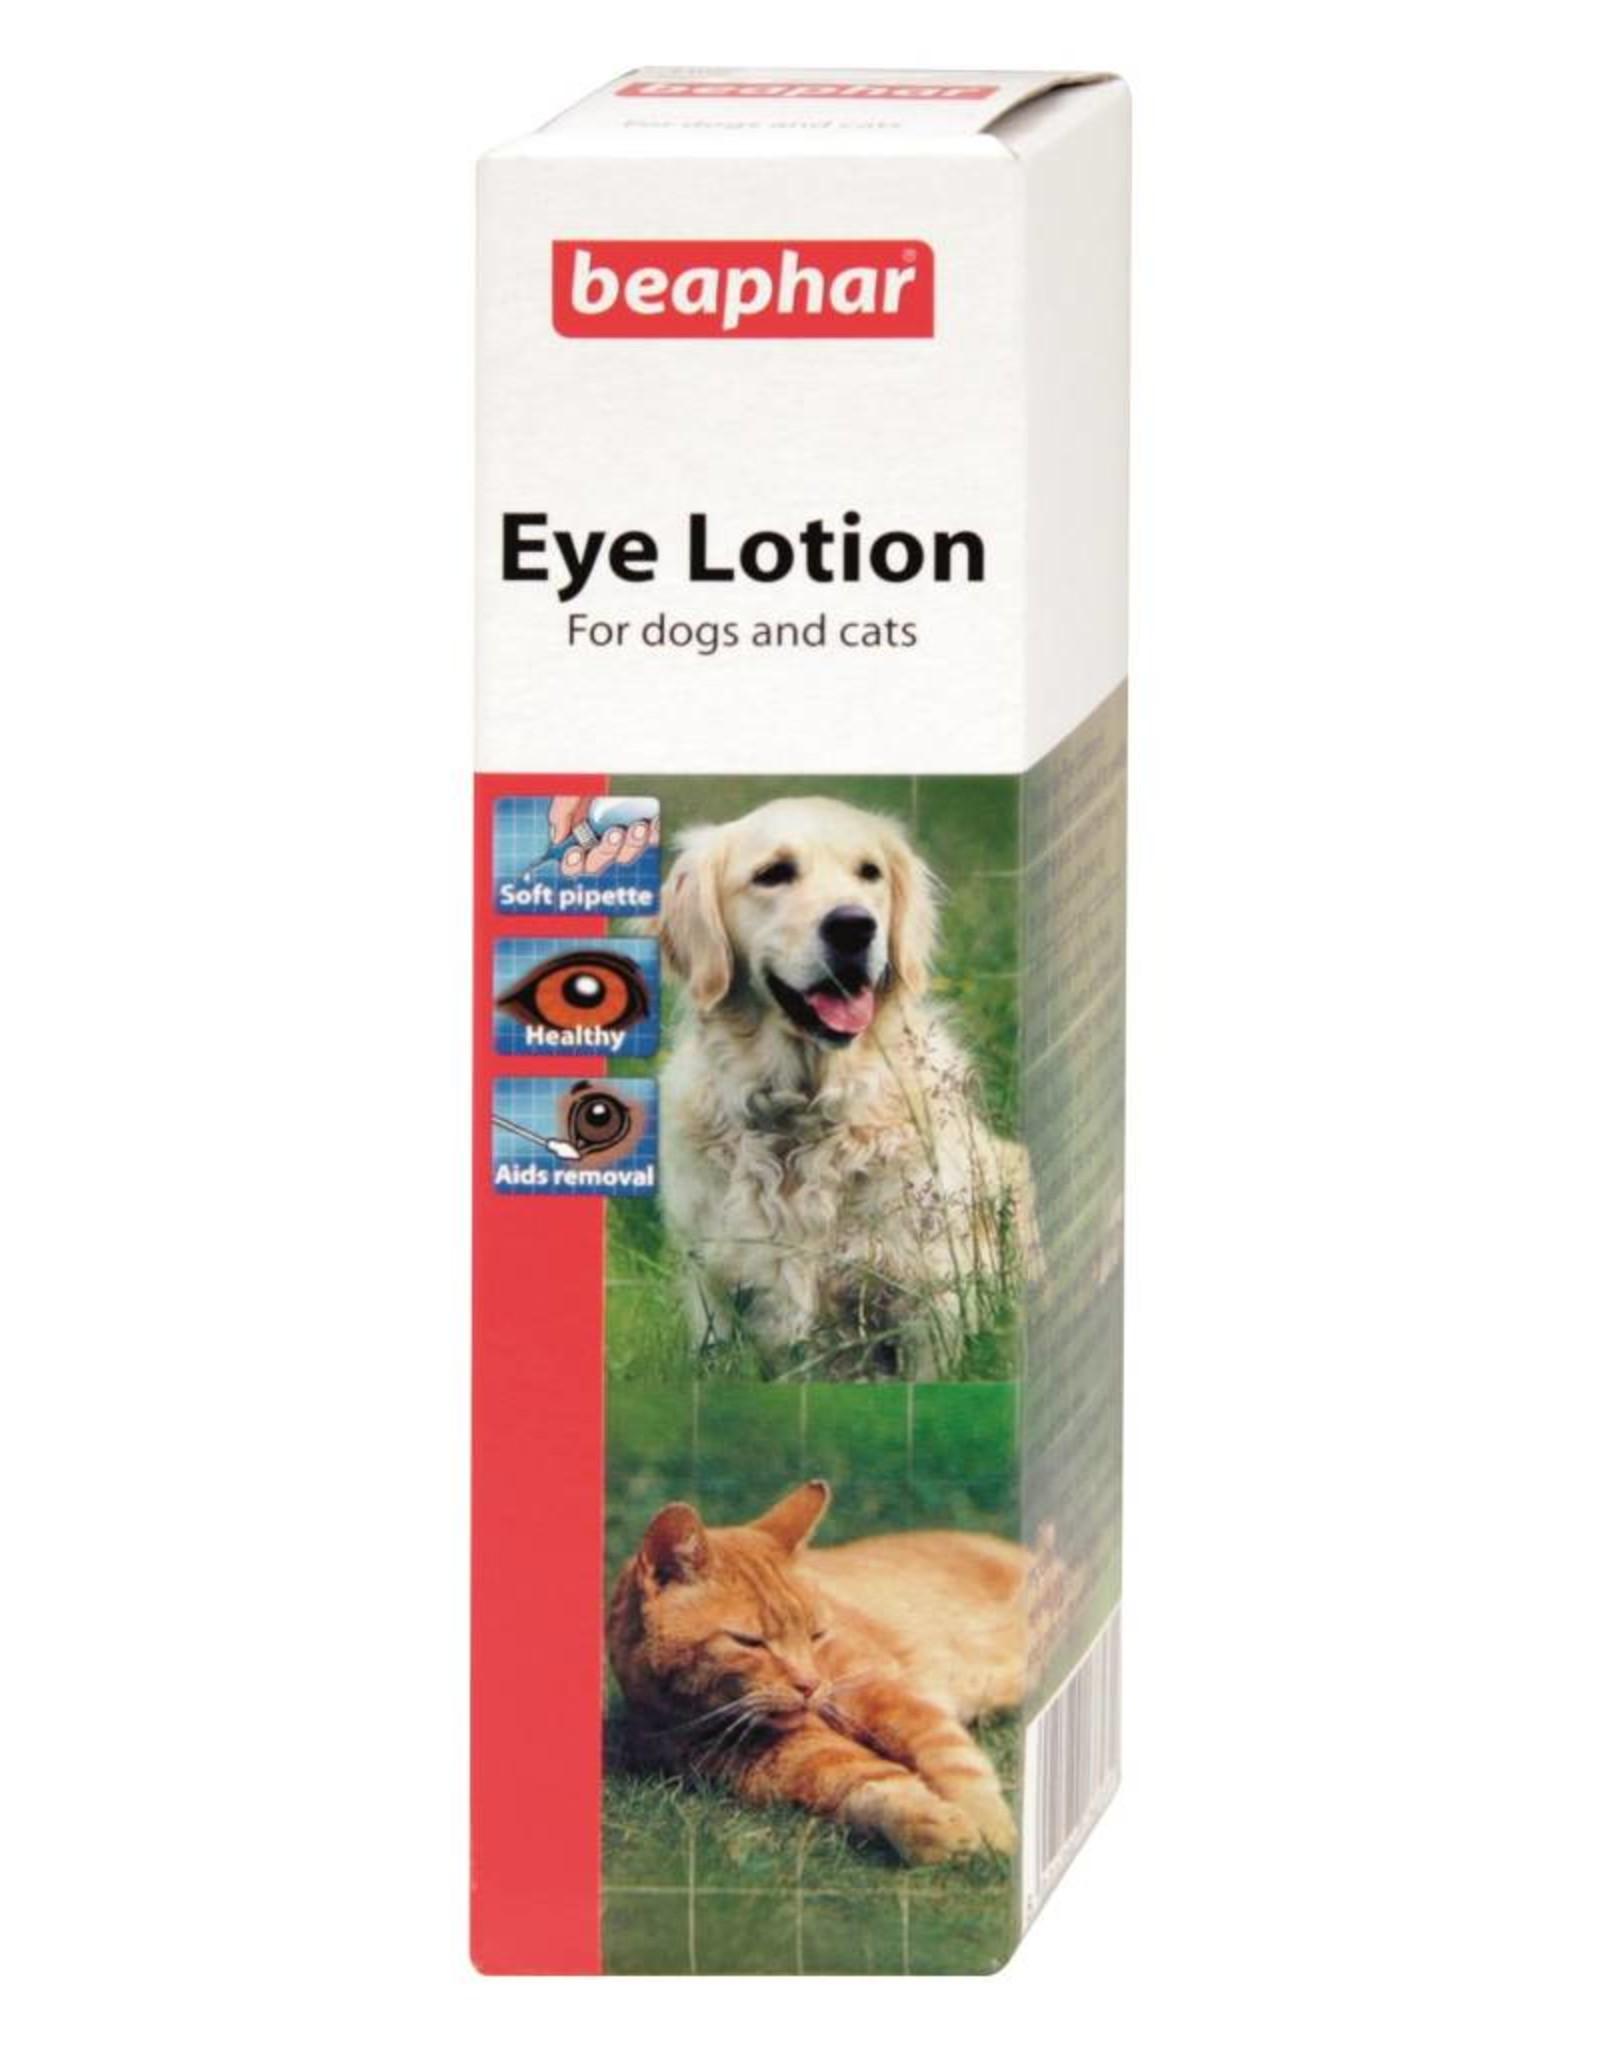 Beaphar Eye Lotion for Cats & Dogs, 50ml